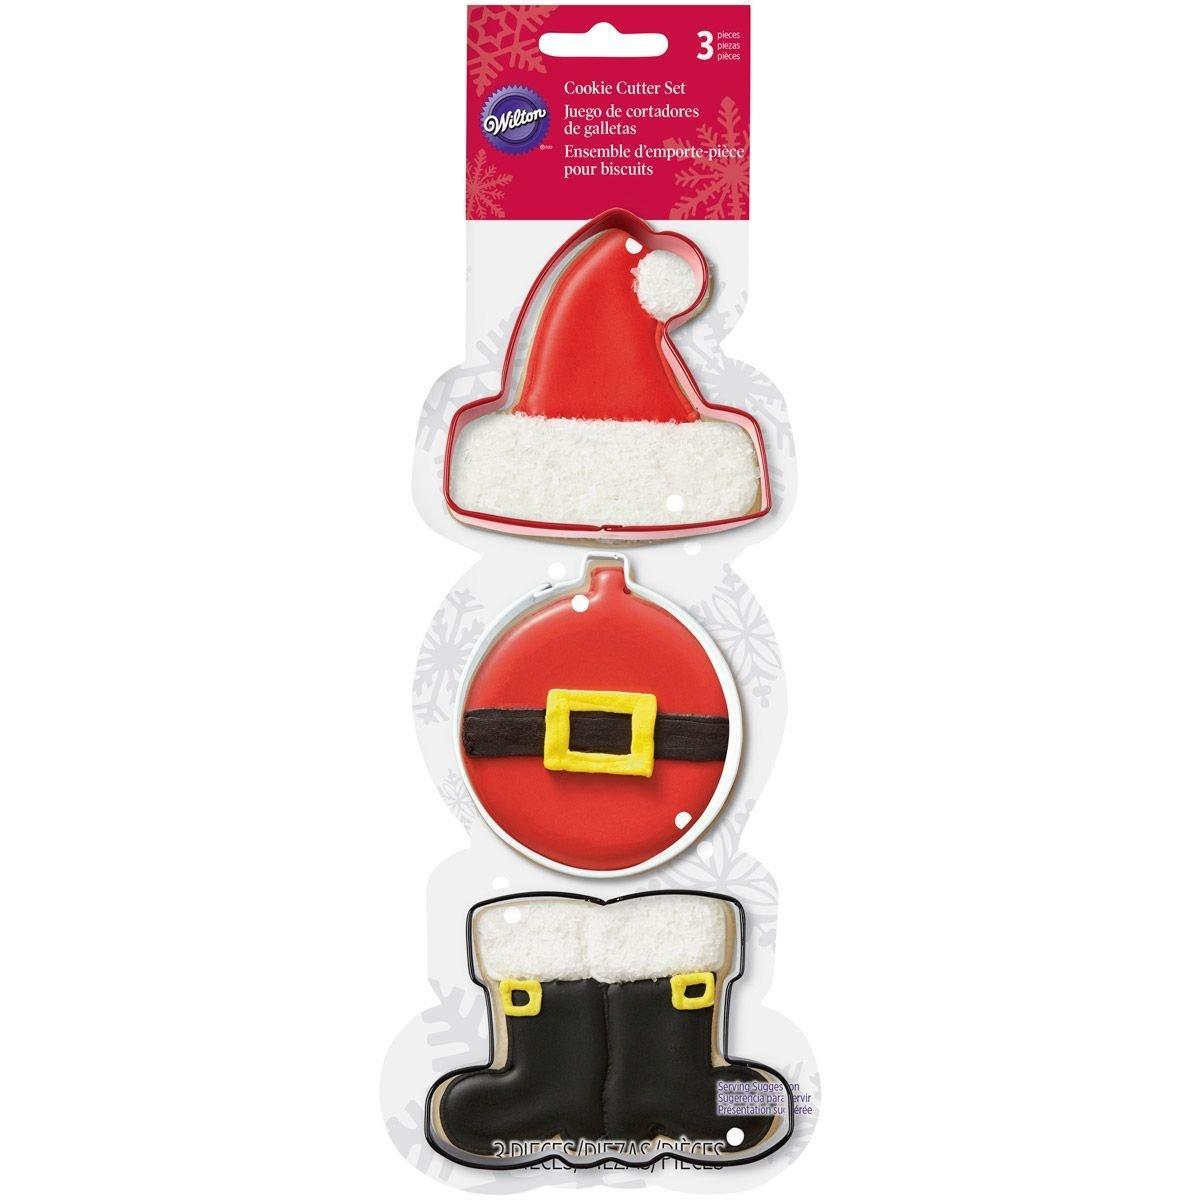 Wilton Christmas Cookie Cutter Set of 3 -SANTA HAT, BOOTS & BAUBLE -Σετ 3τεμ Κουπ πατ Σκούφος Αγ.Βασίλη, Μπότες και Στολίδι